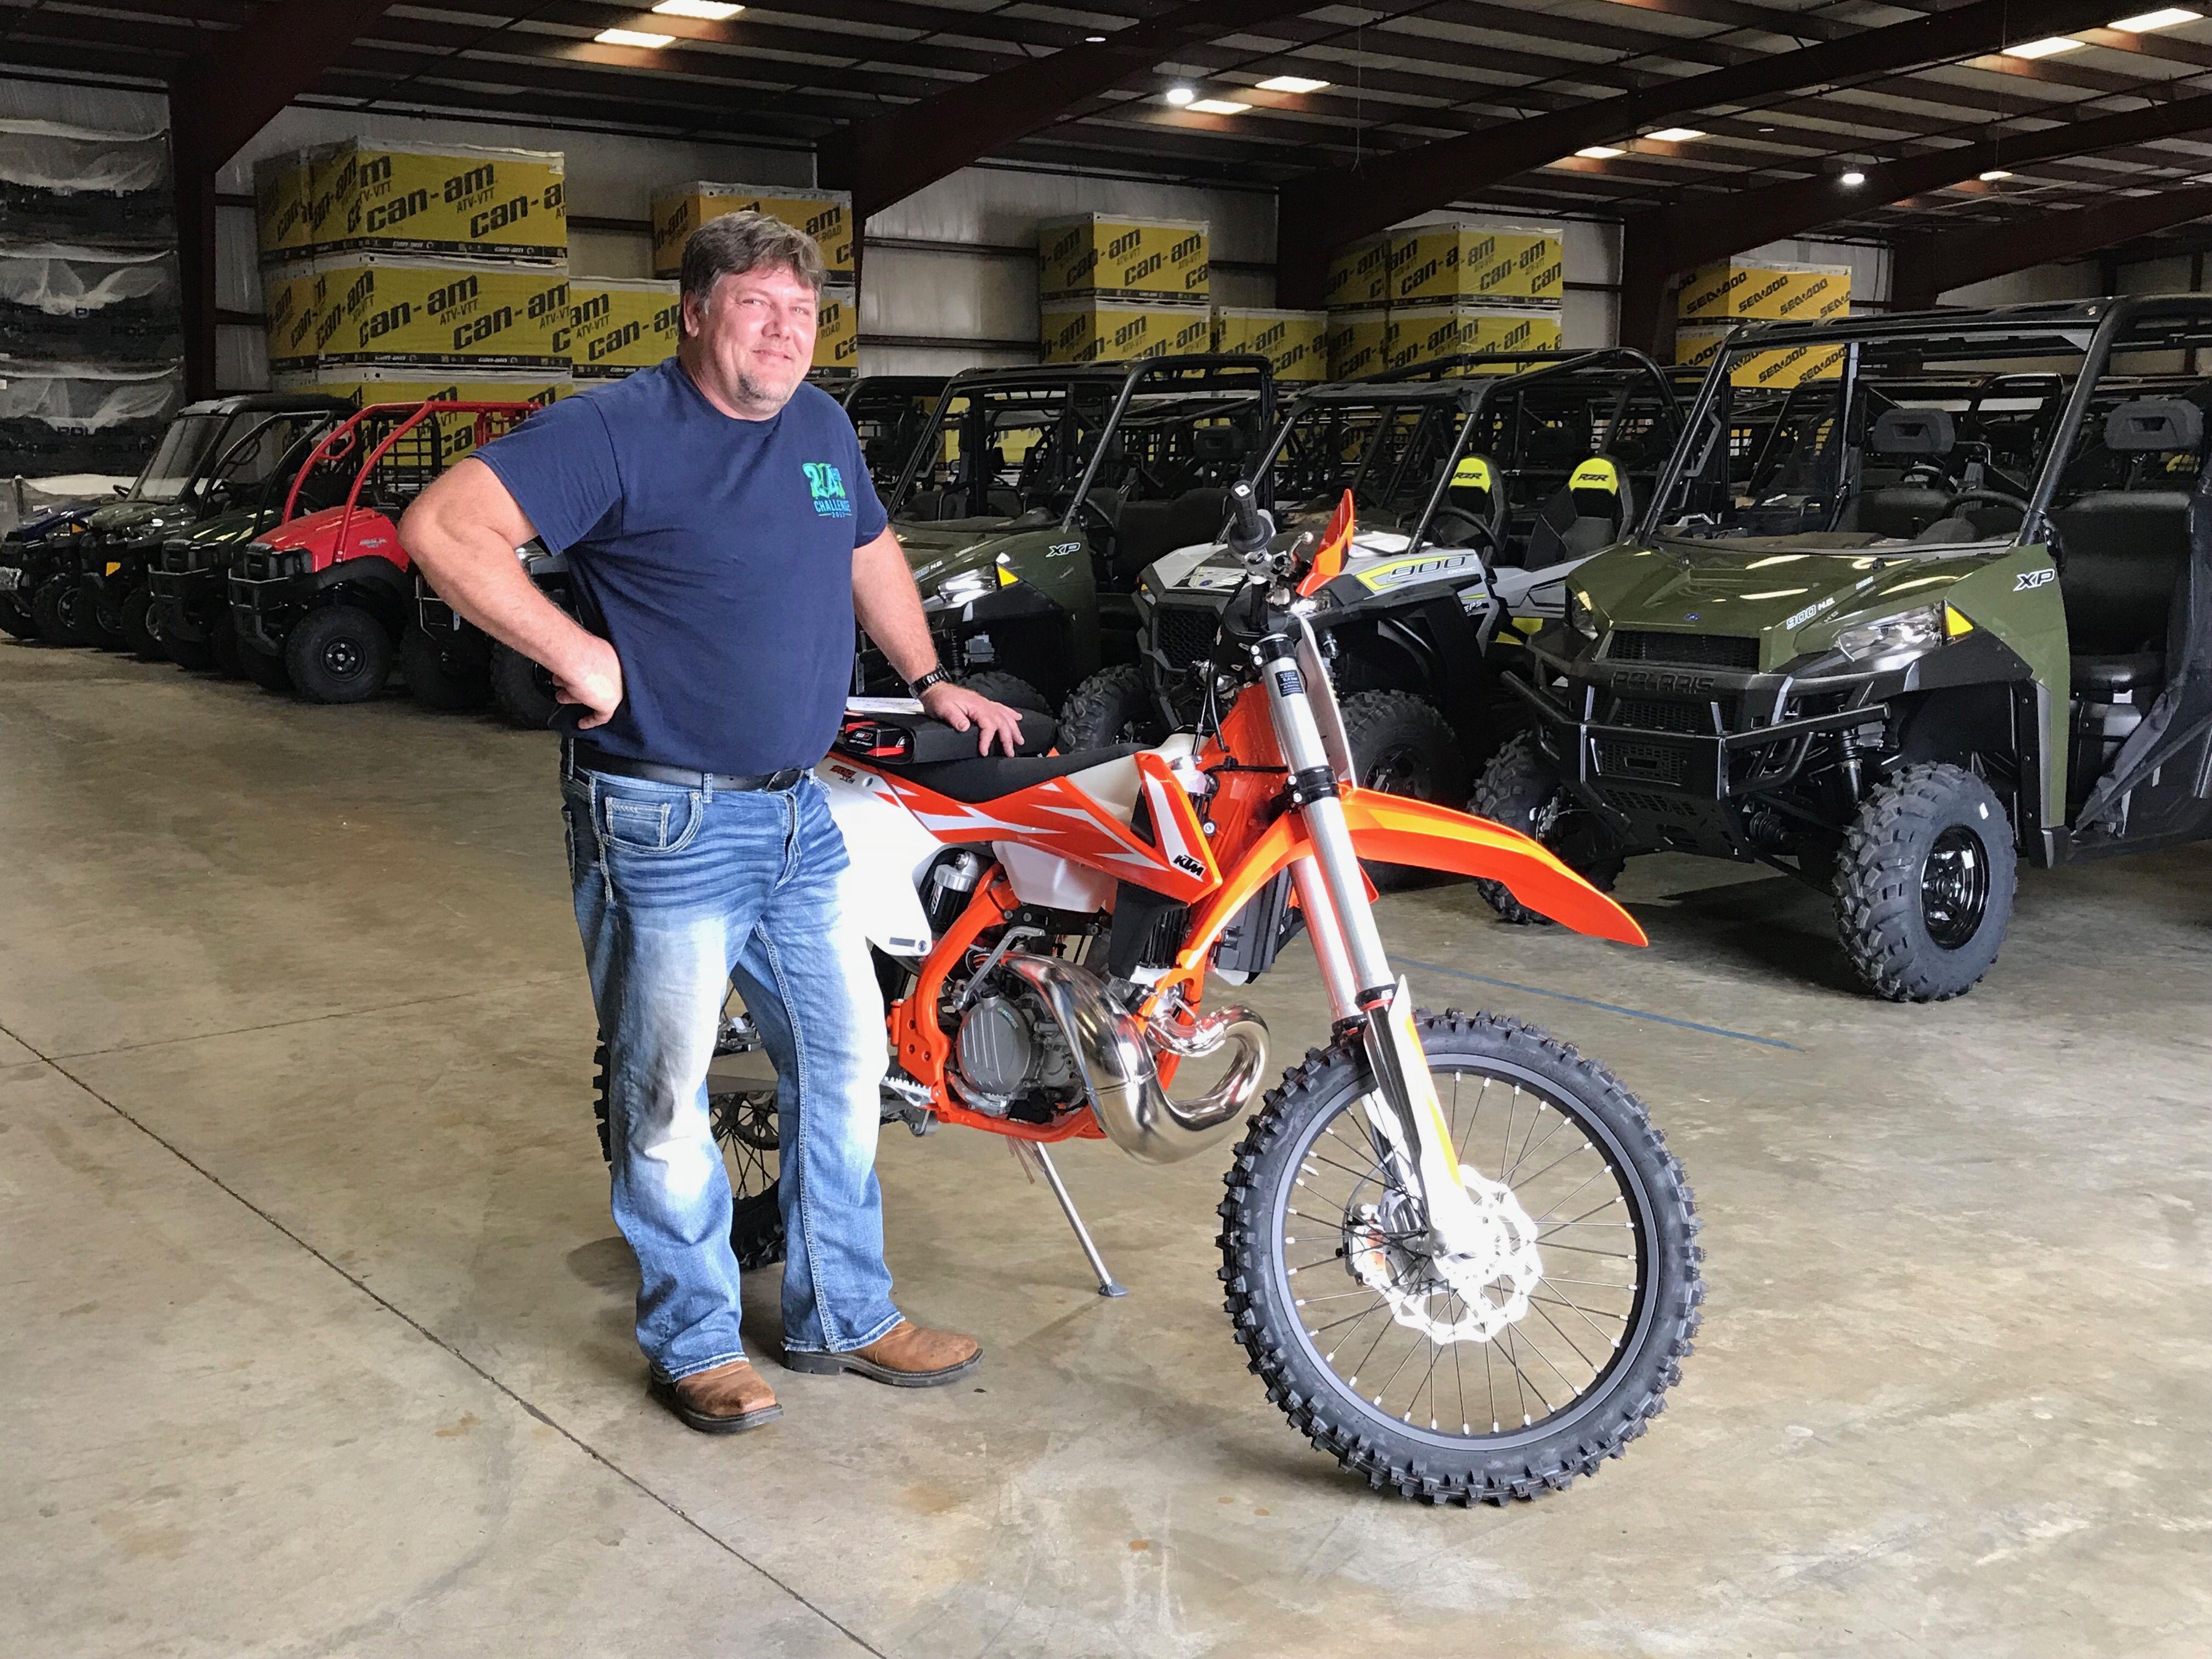 Congratulations to Michael Green from Plantersville, AL for